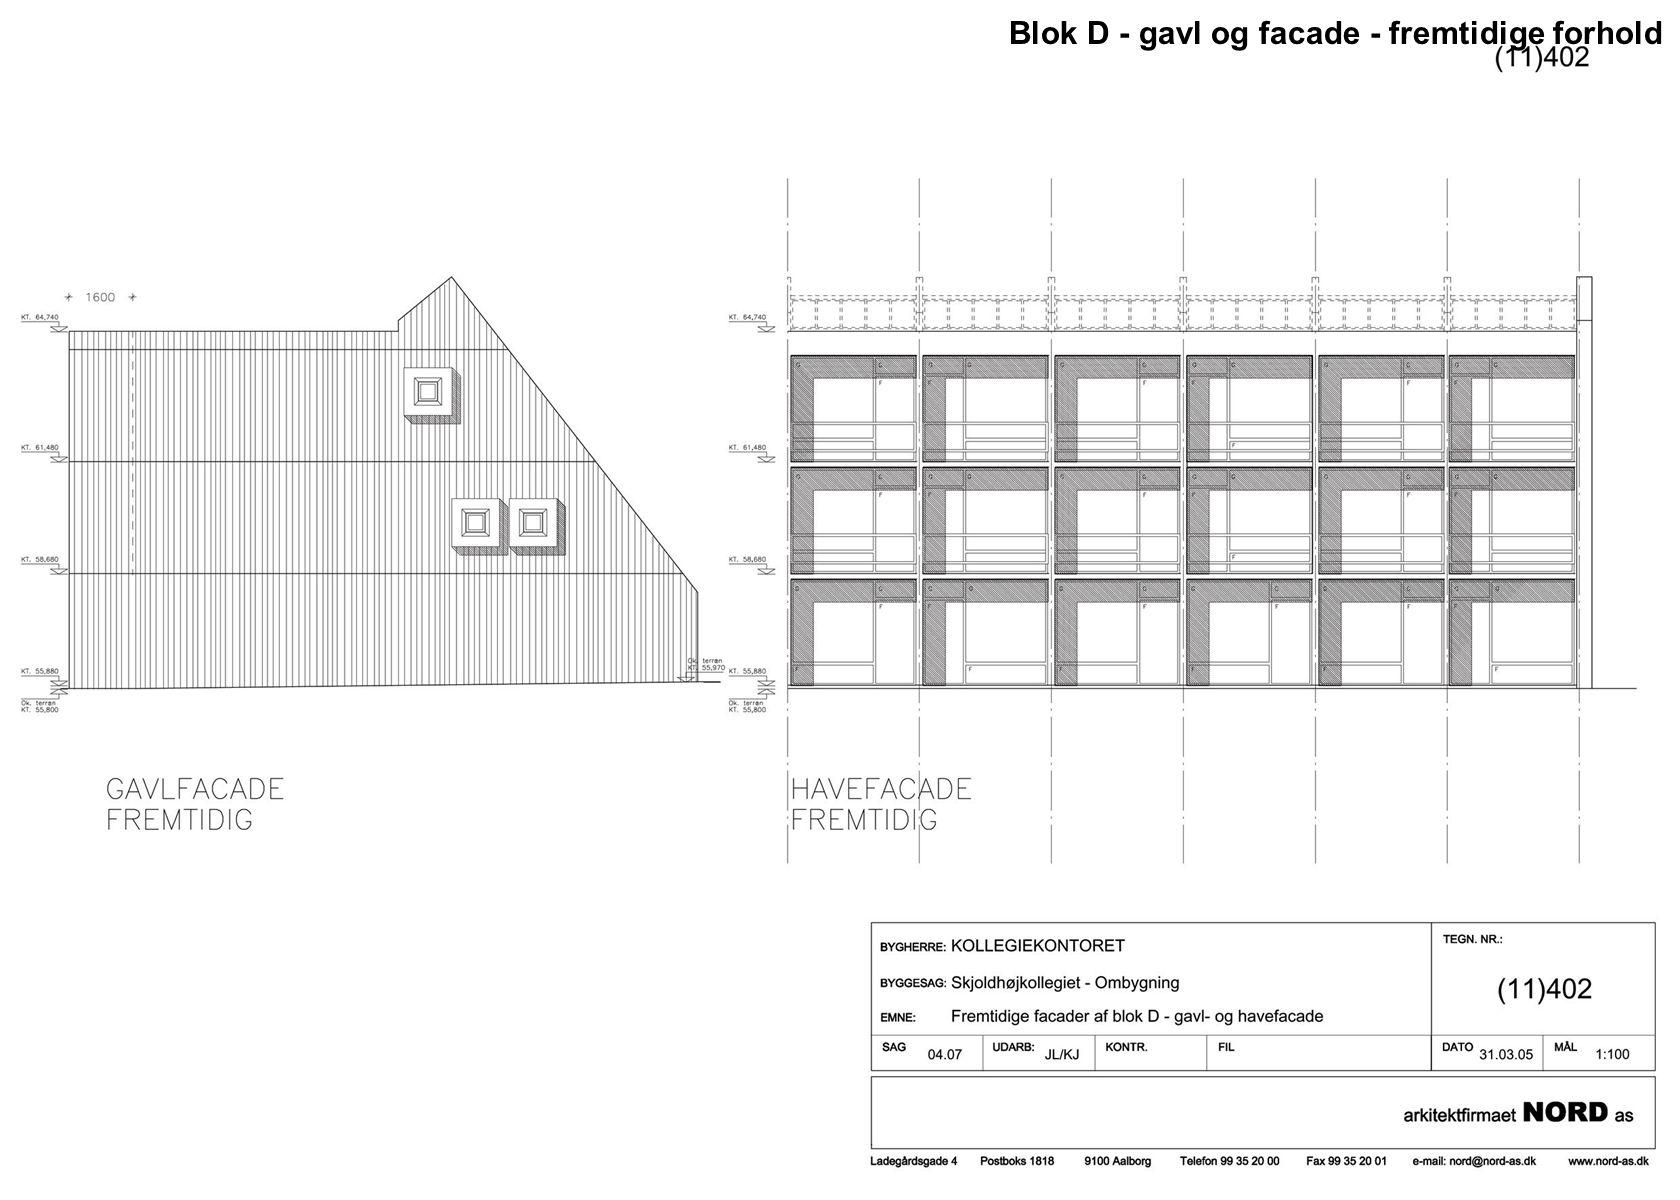 Blok D - gavl og facade - fremtidige forhold